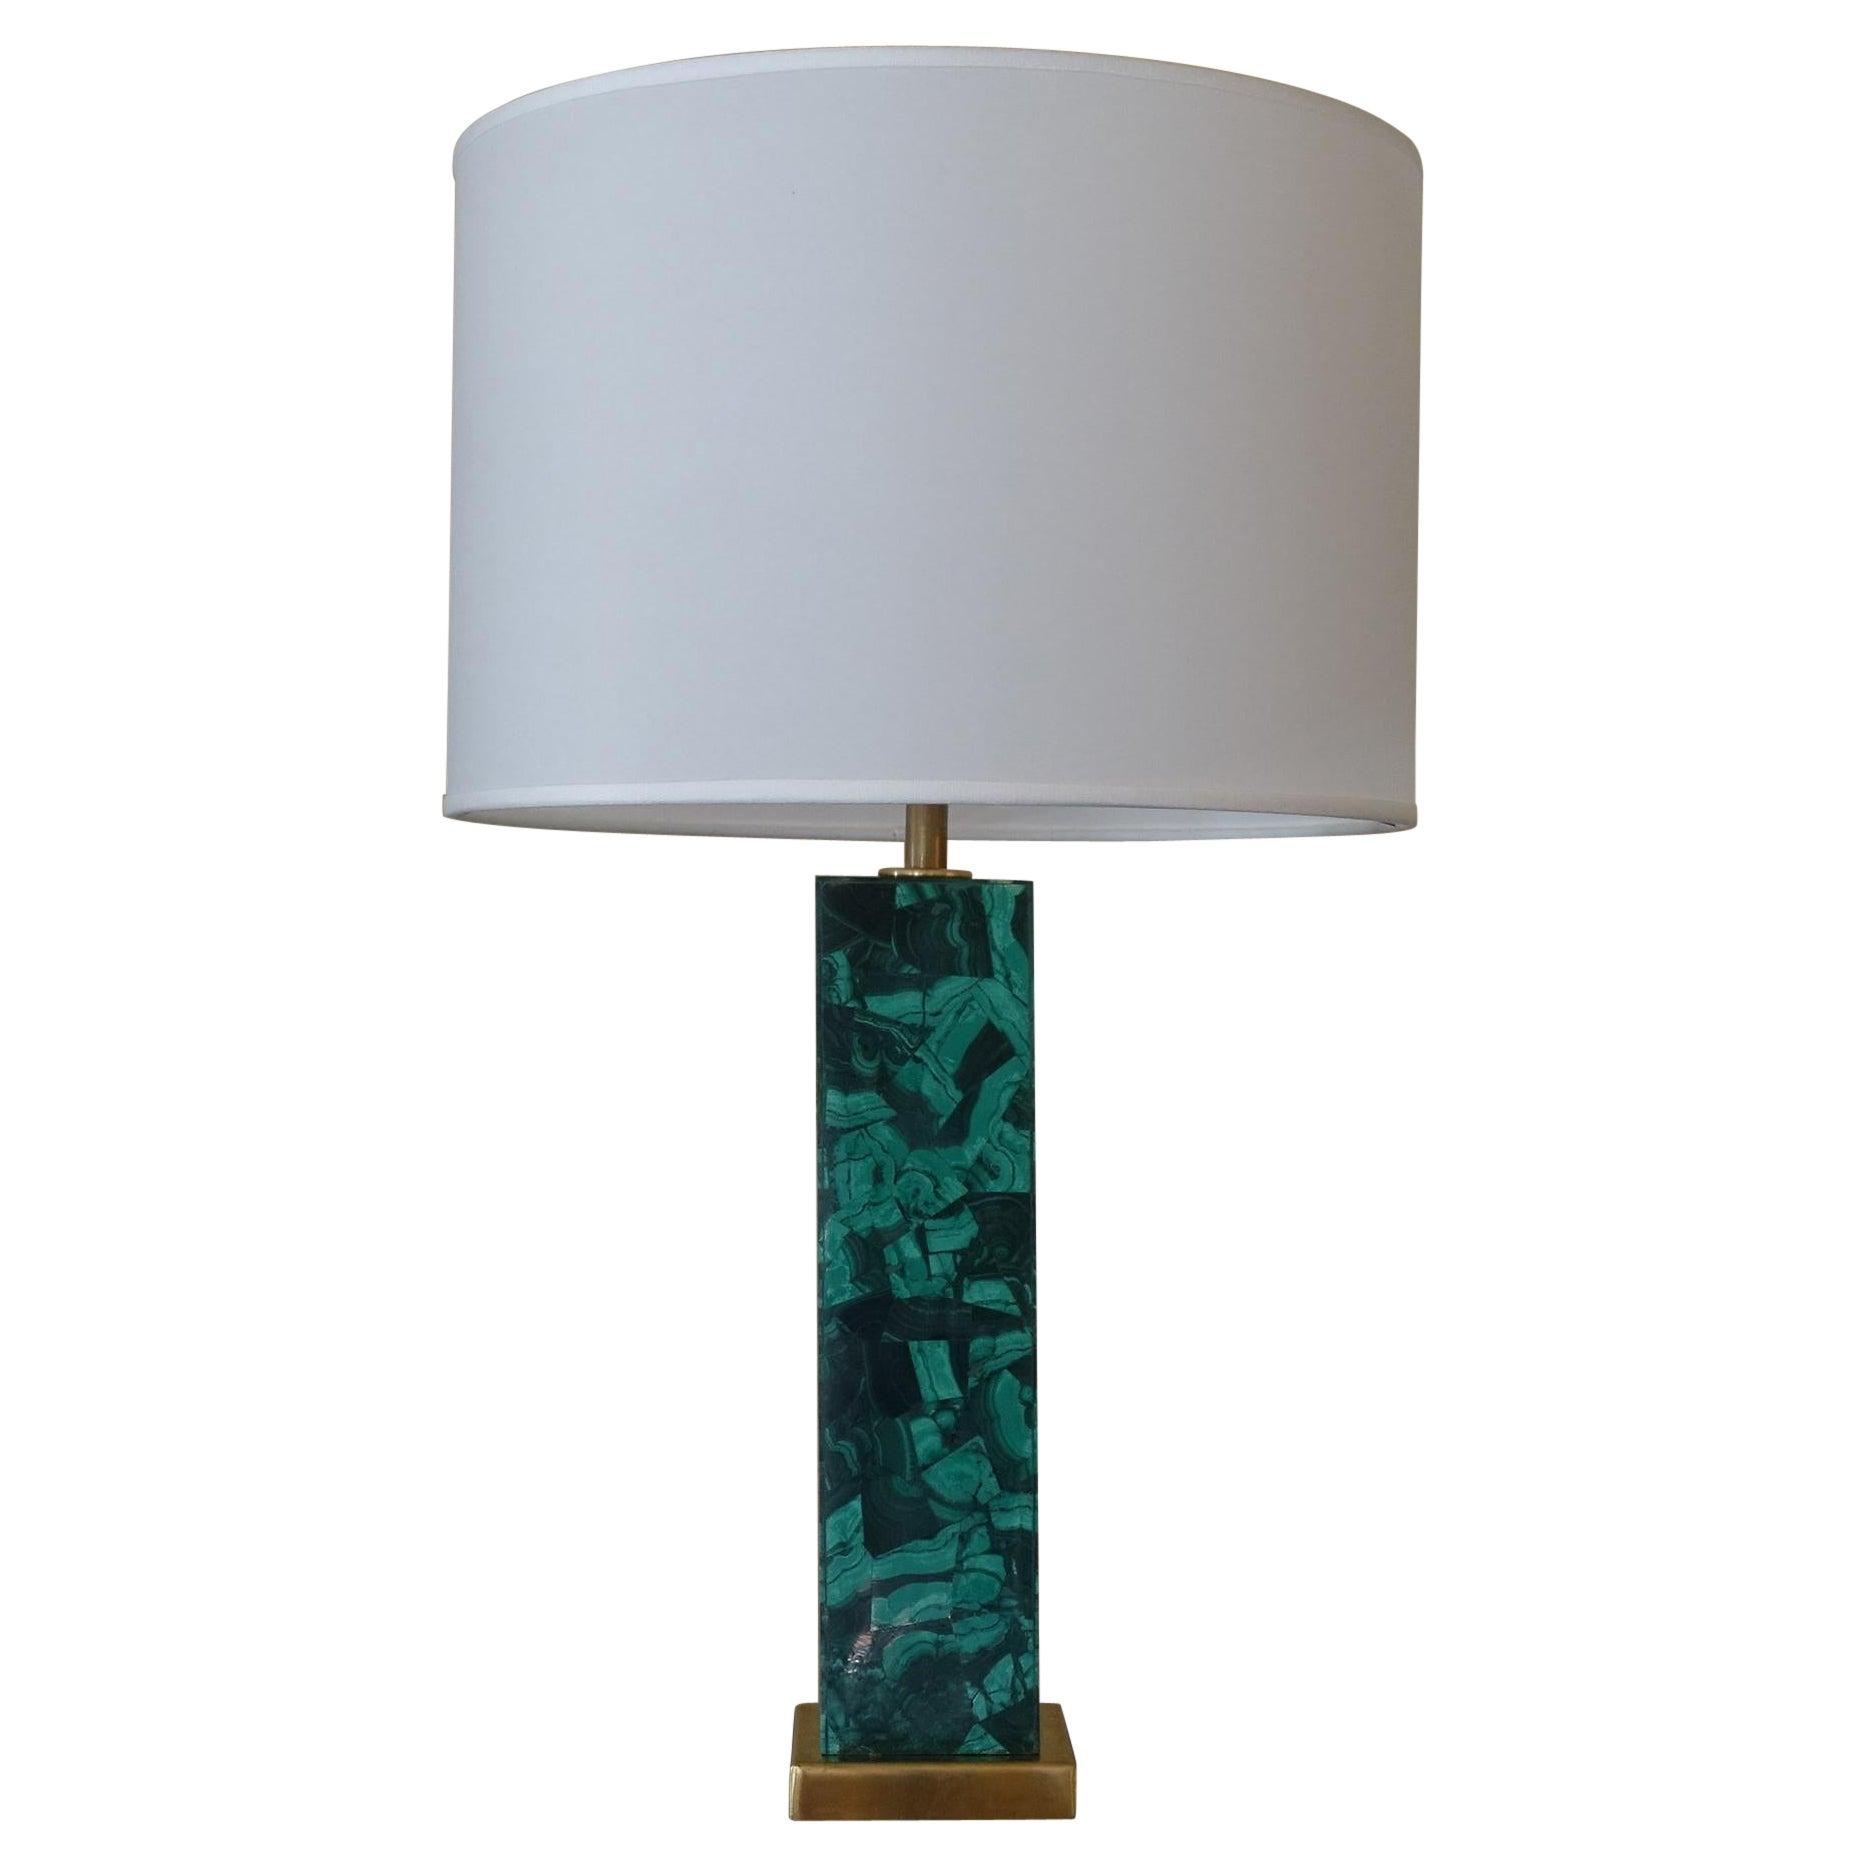 Malachite Decorative Table Lamp, Brass Details